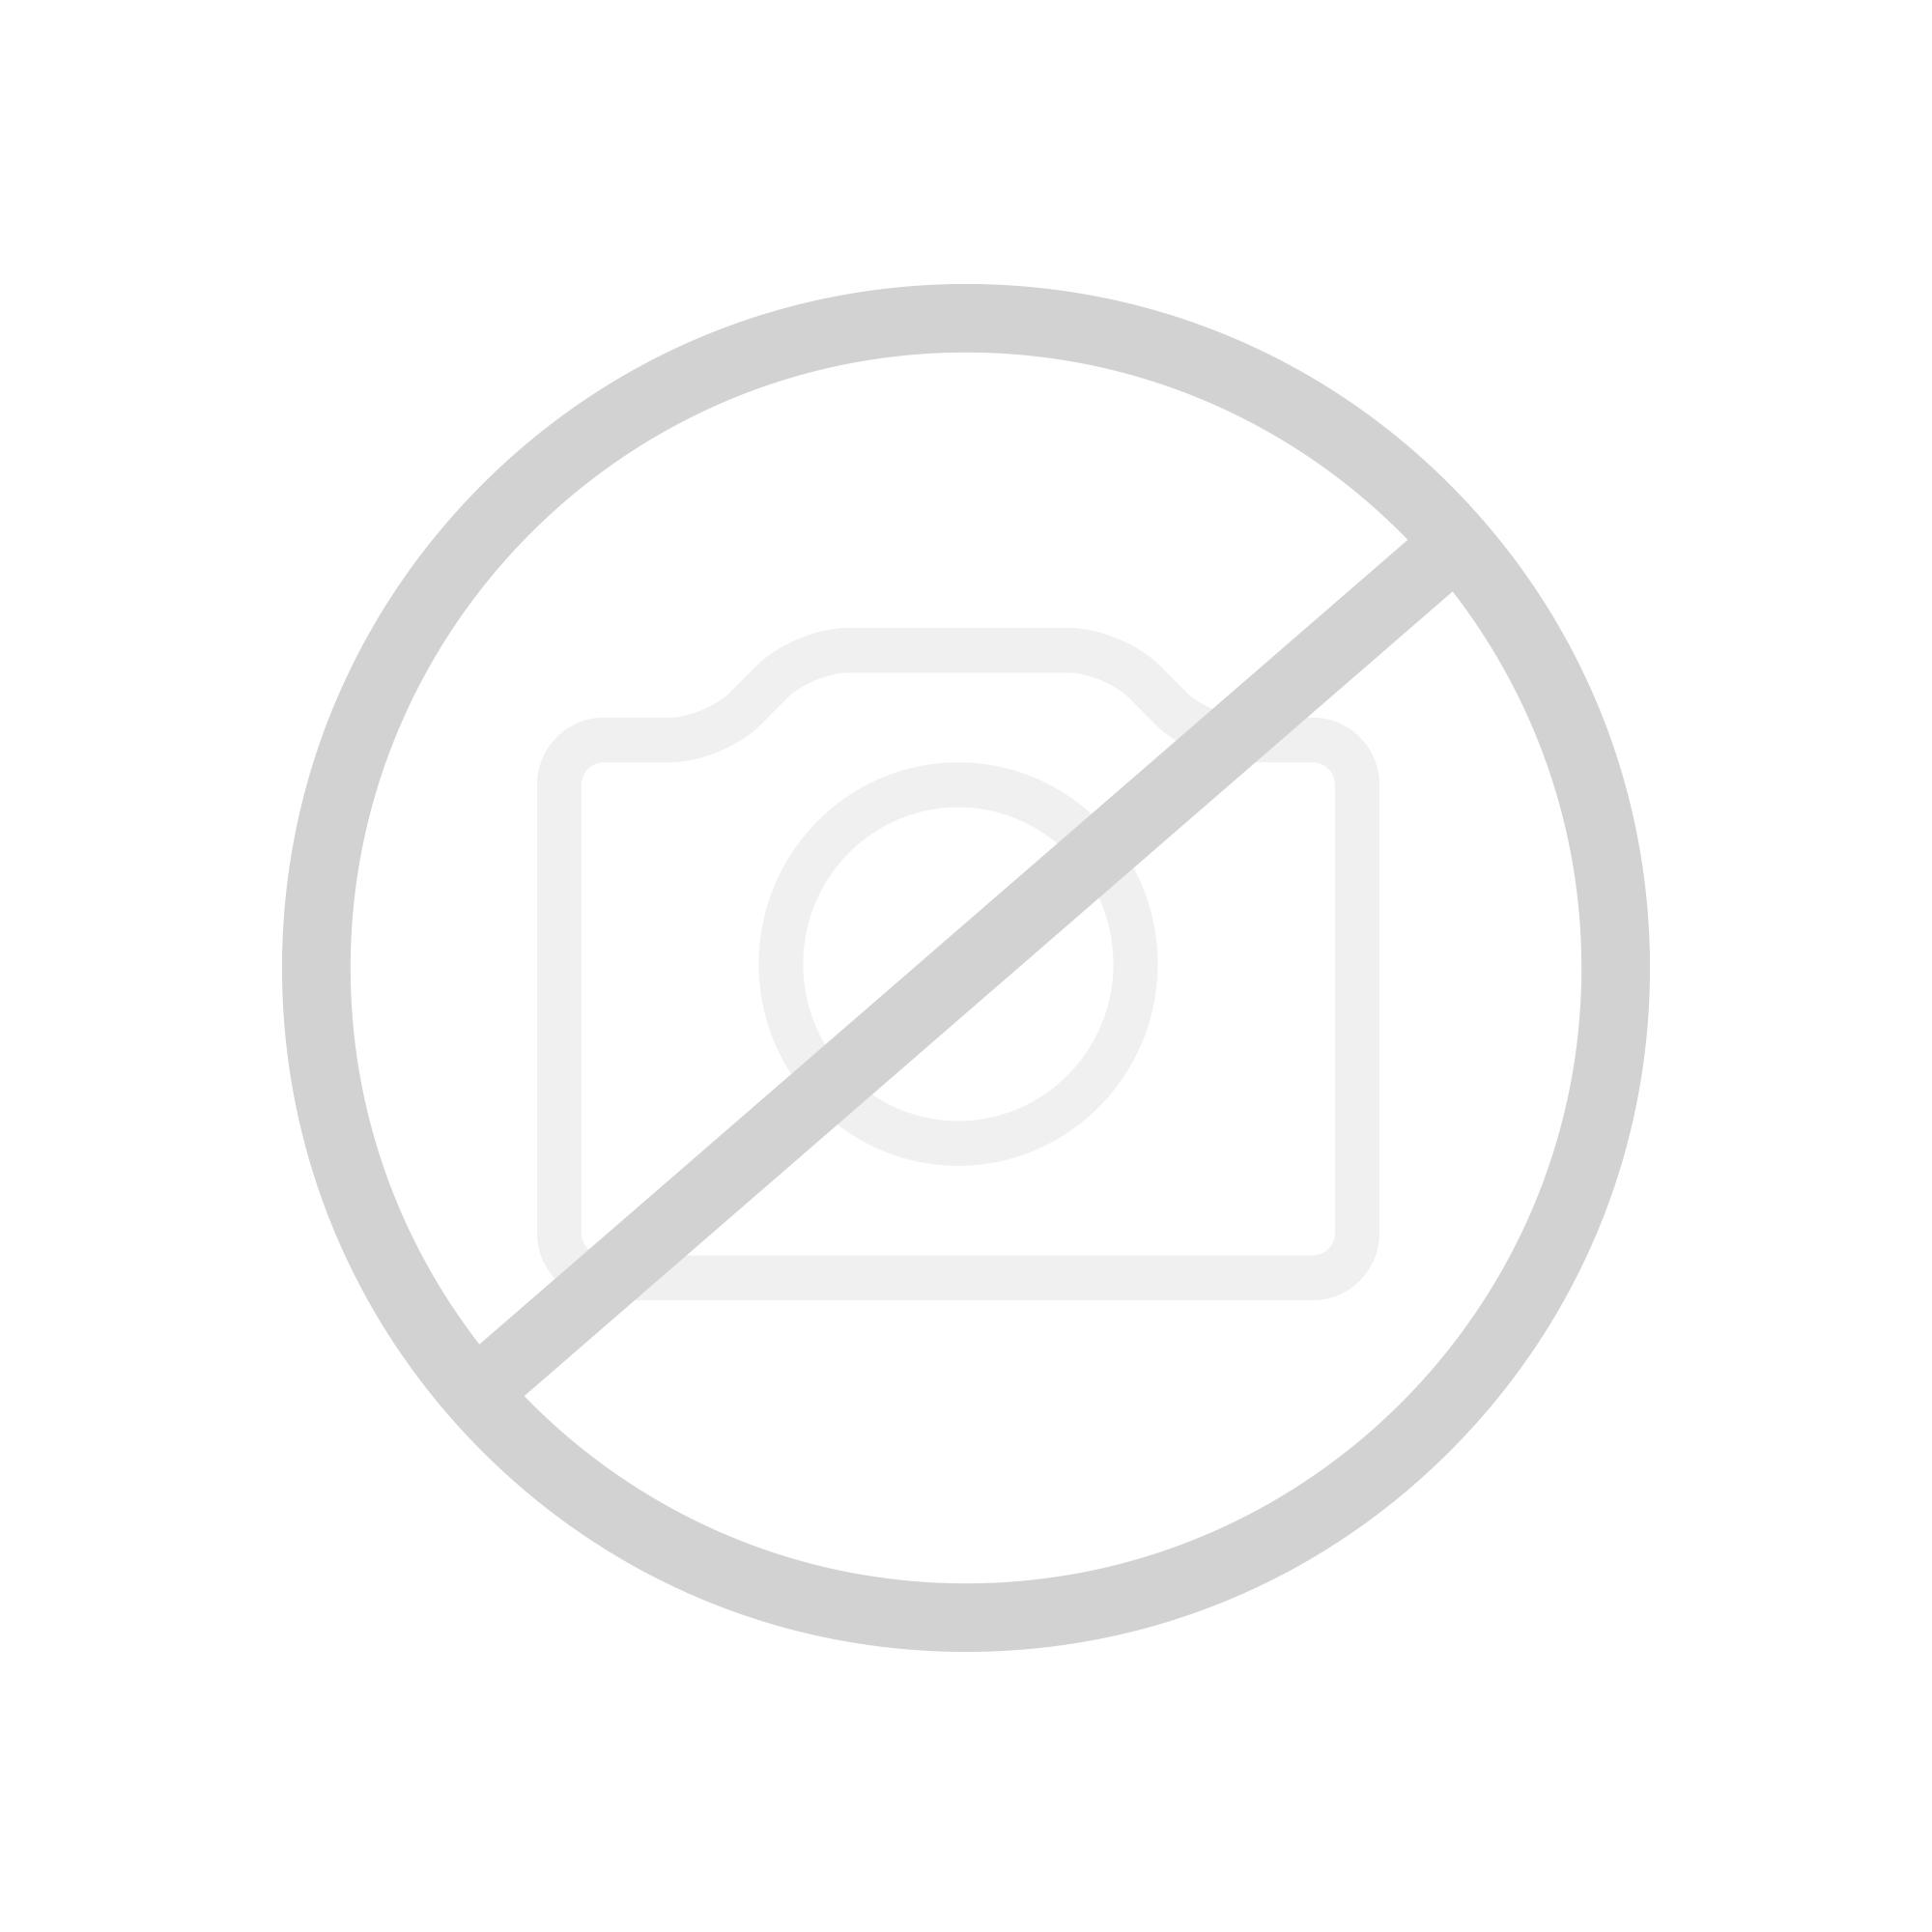 grohe rapid sl montageelement f r wand wc drucksp ler 6 9 l 38519001 reuter onlineshop. Black Bedroom Furniture Sets. Home Design Ideas